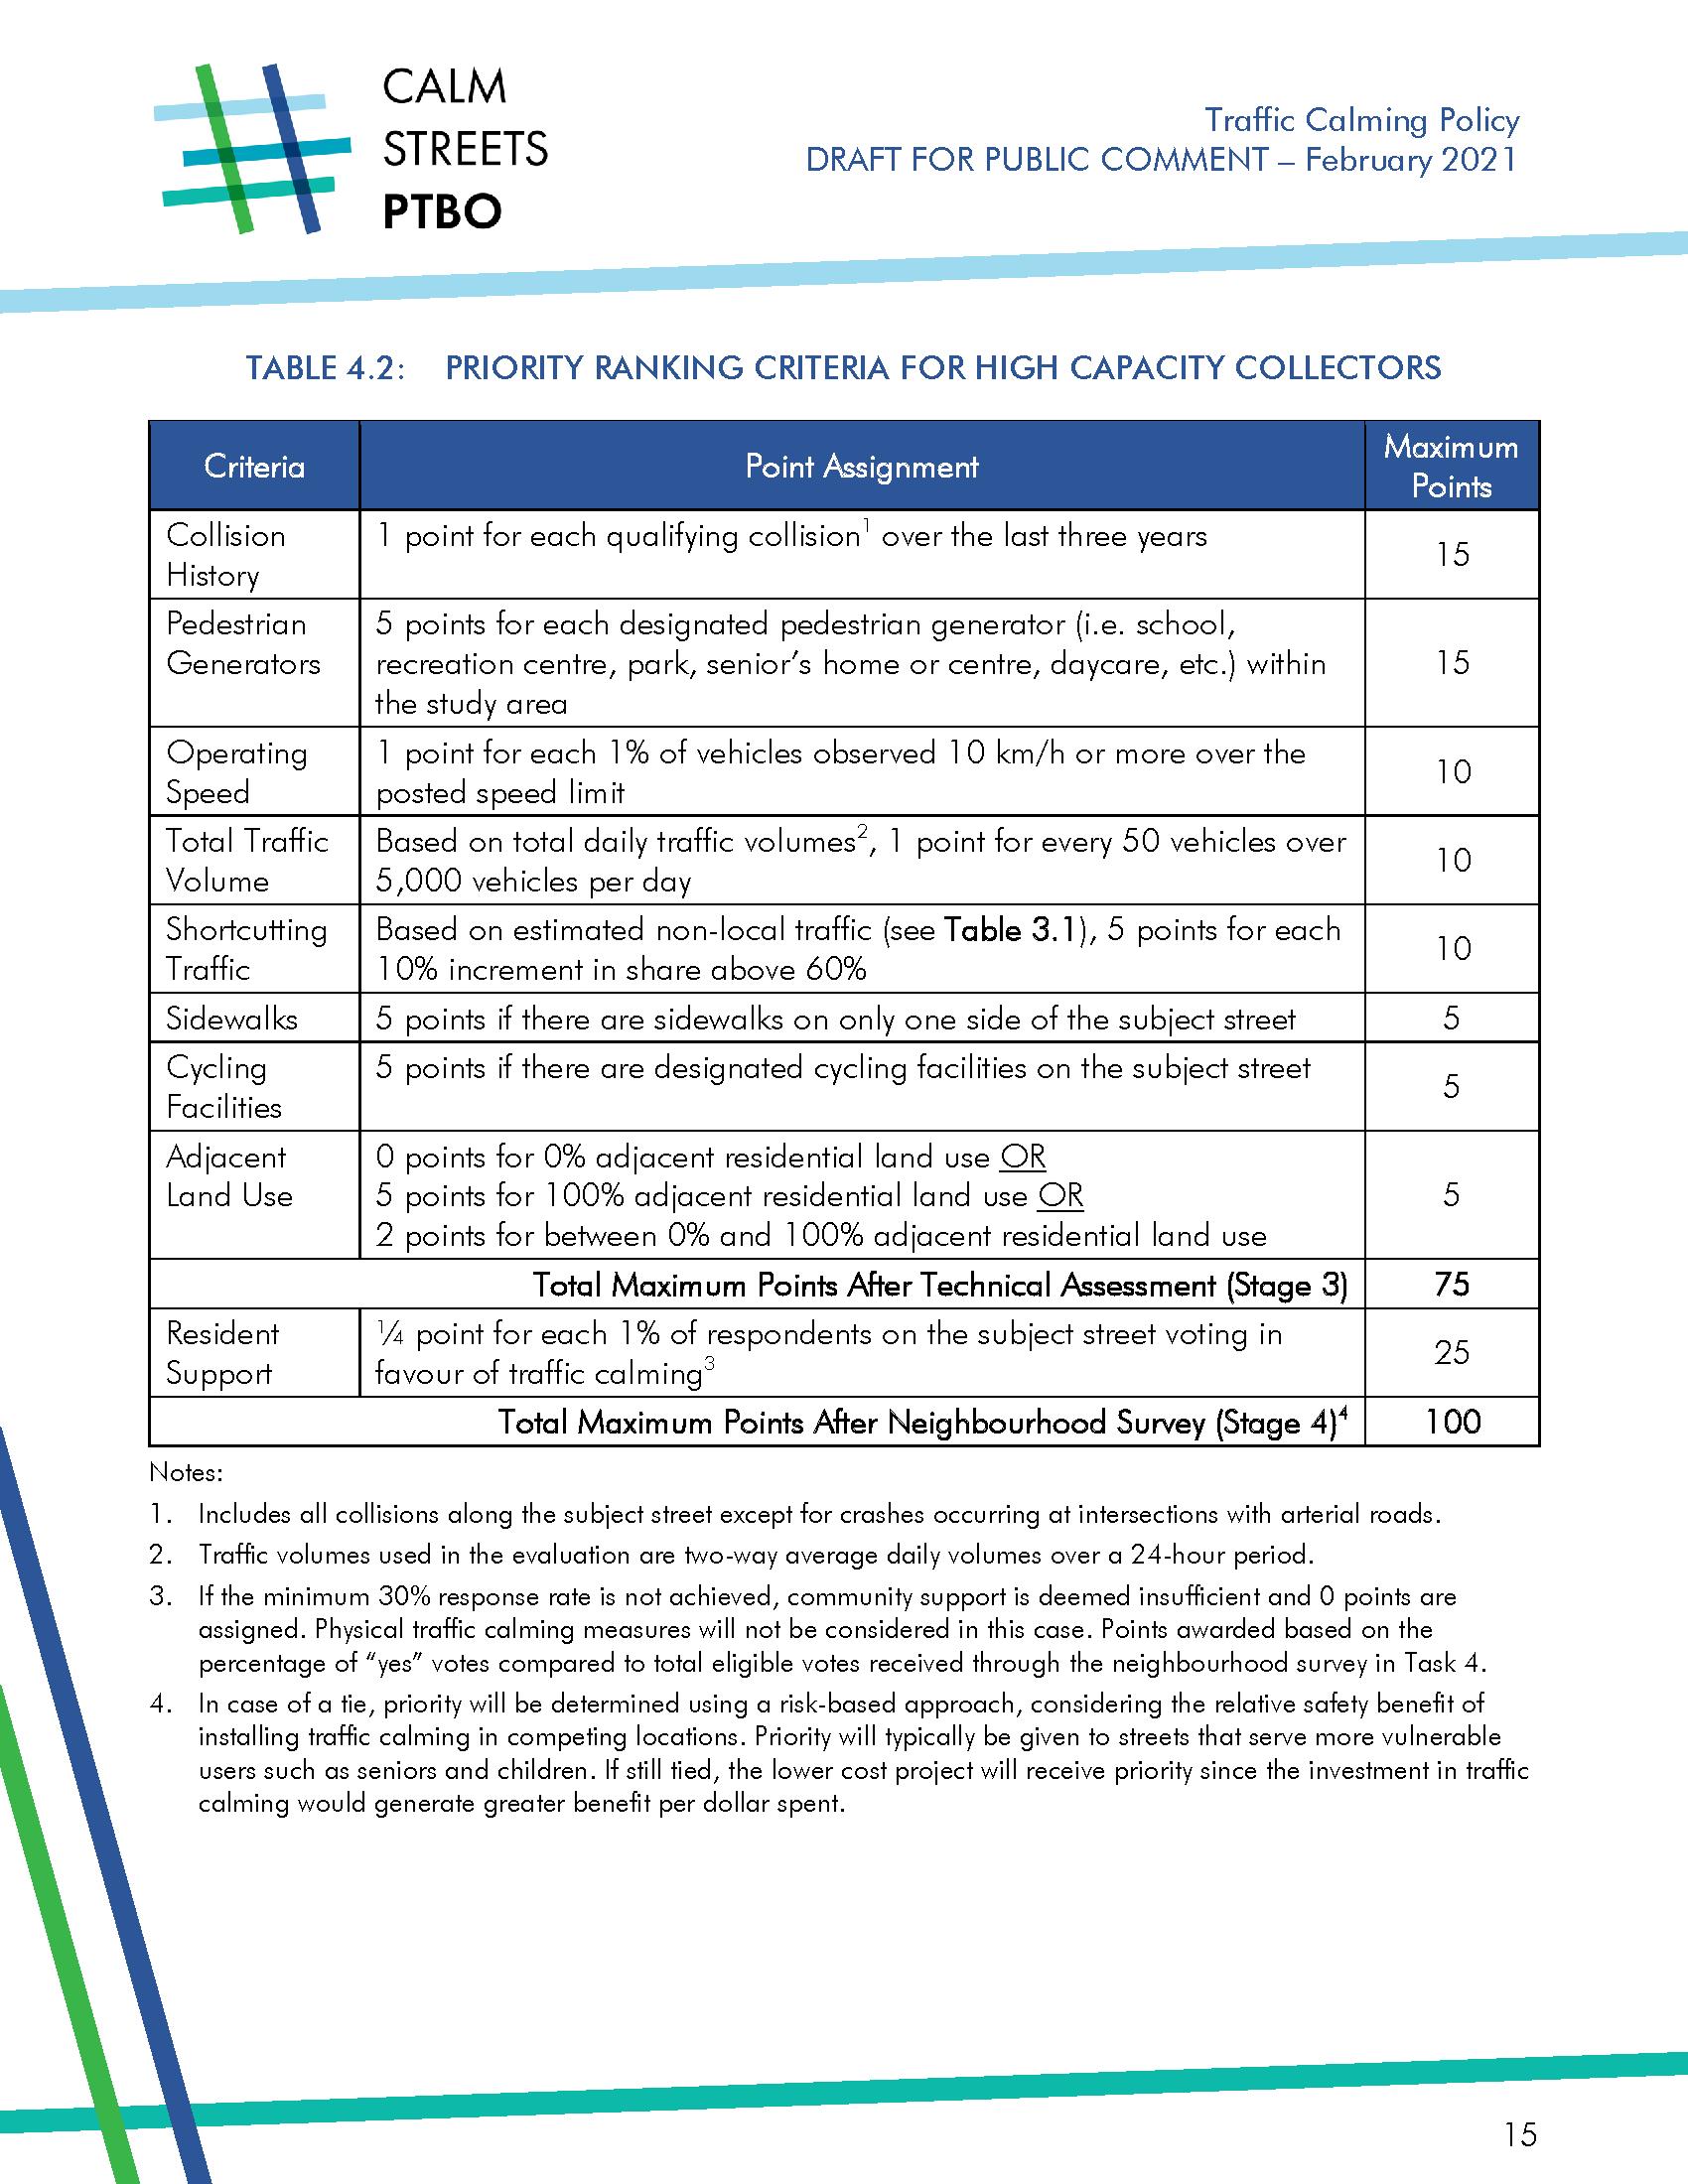 Prioritization Criteria for High Capacity Collectors